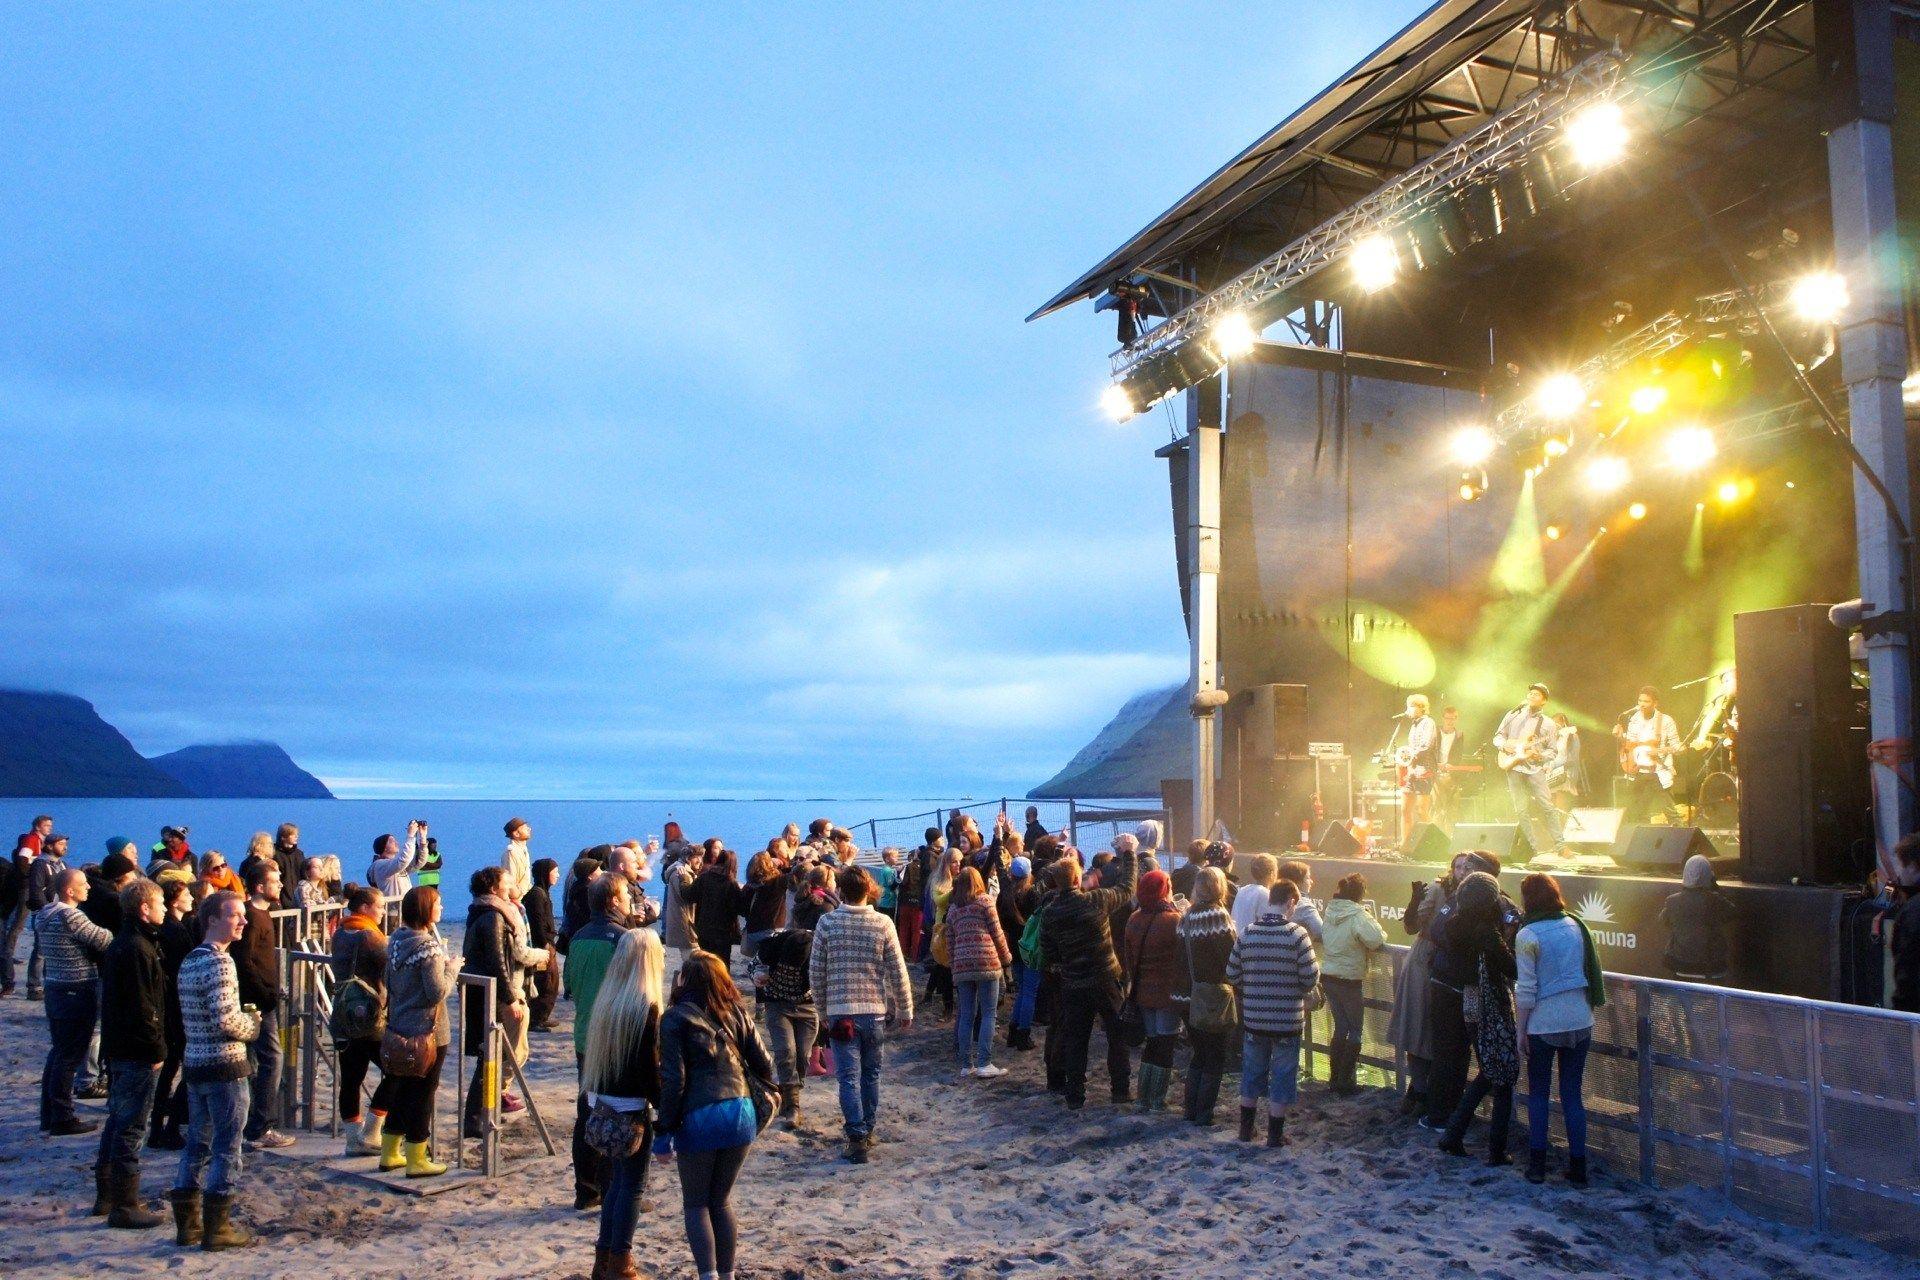 Kết quả hình ảnh cho festival at faroe islands